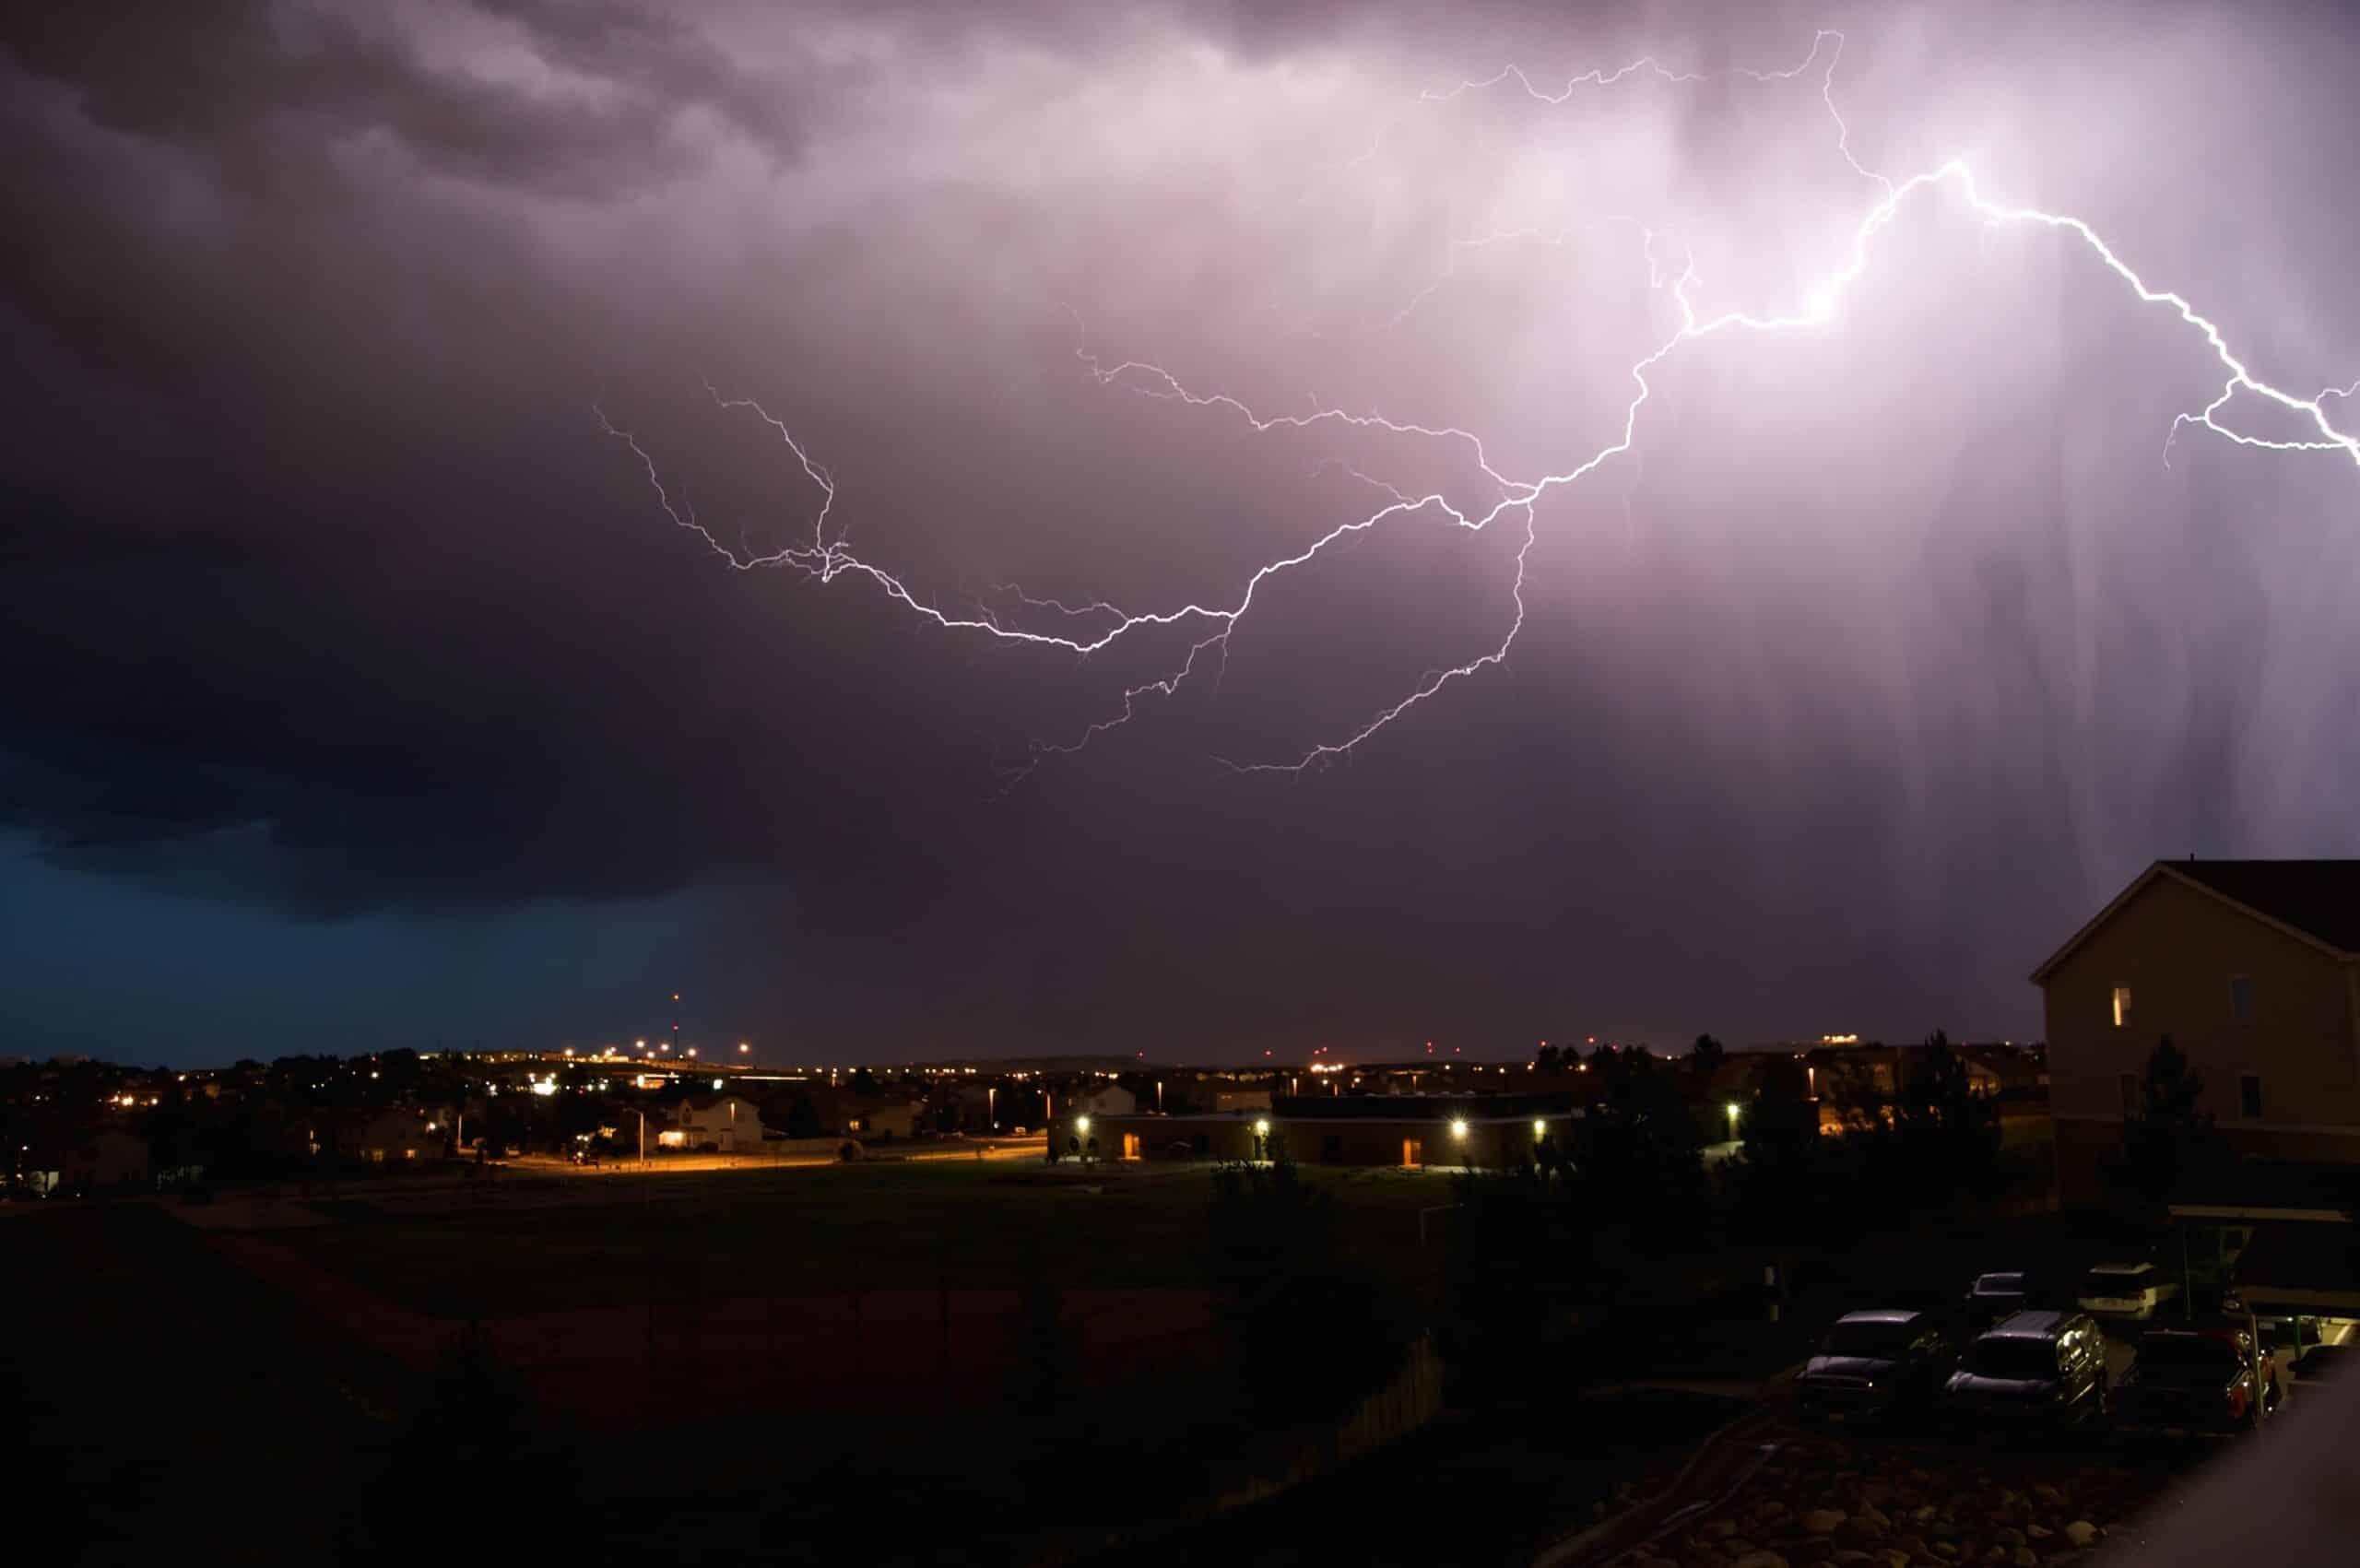 AC Storm Damage in Shawnee, KS